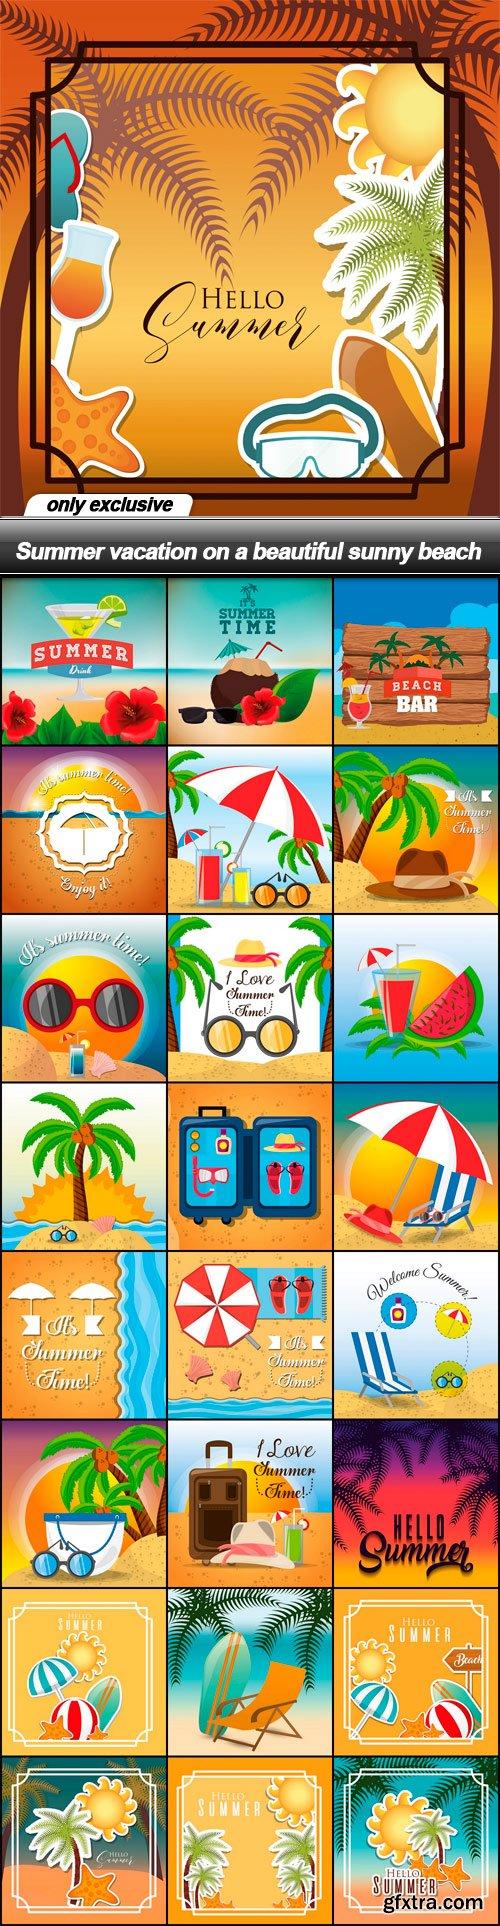 Summer vacation on a beautiful sunny beach - 25 EPS